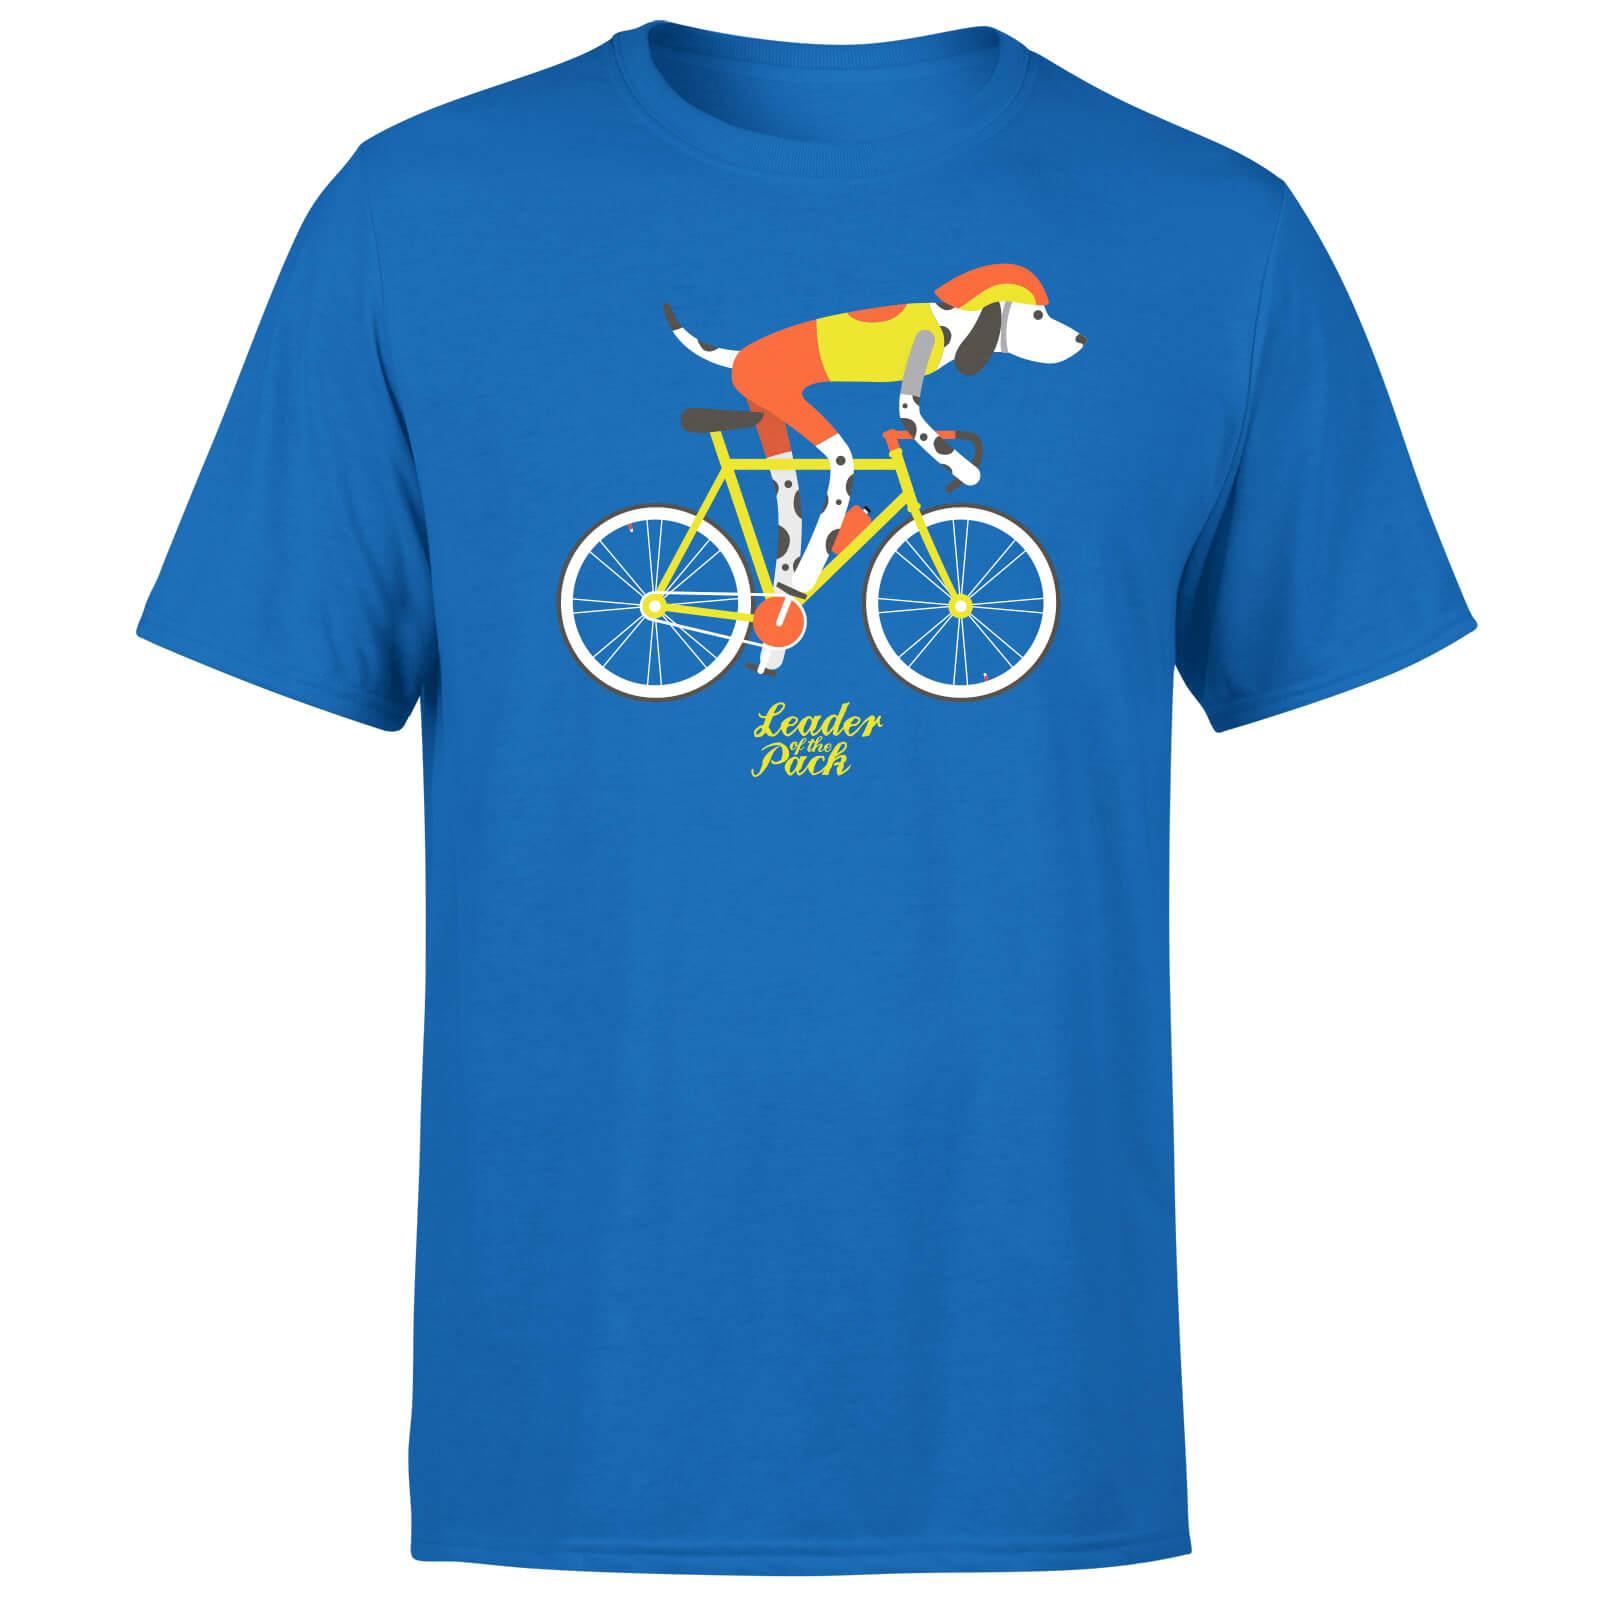 Leader Of The Pack Men's Blue T-Shirt - S - Blue